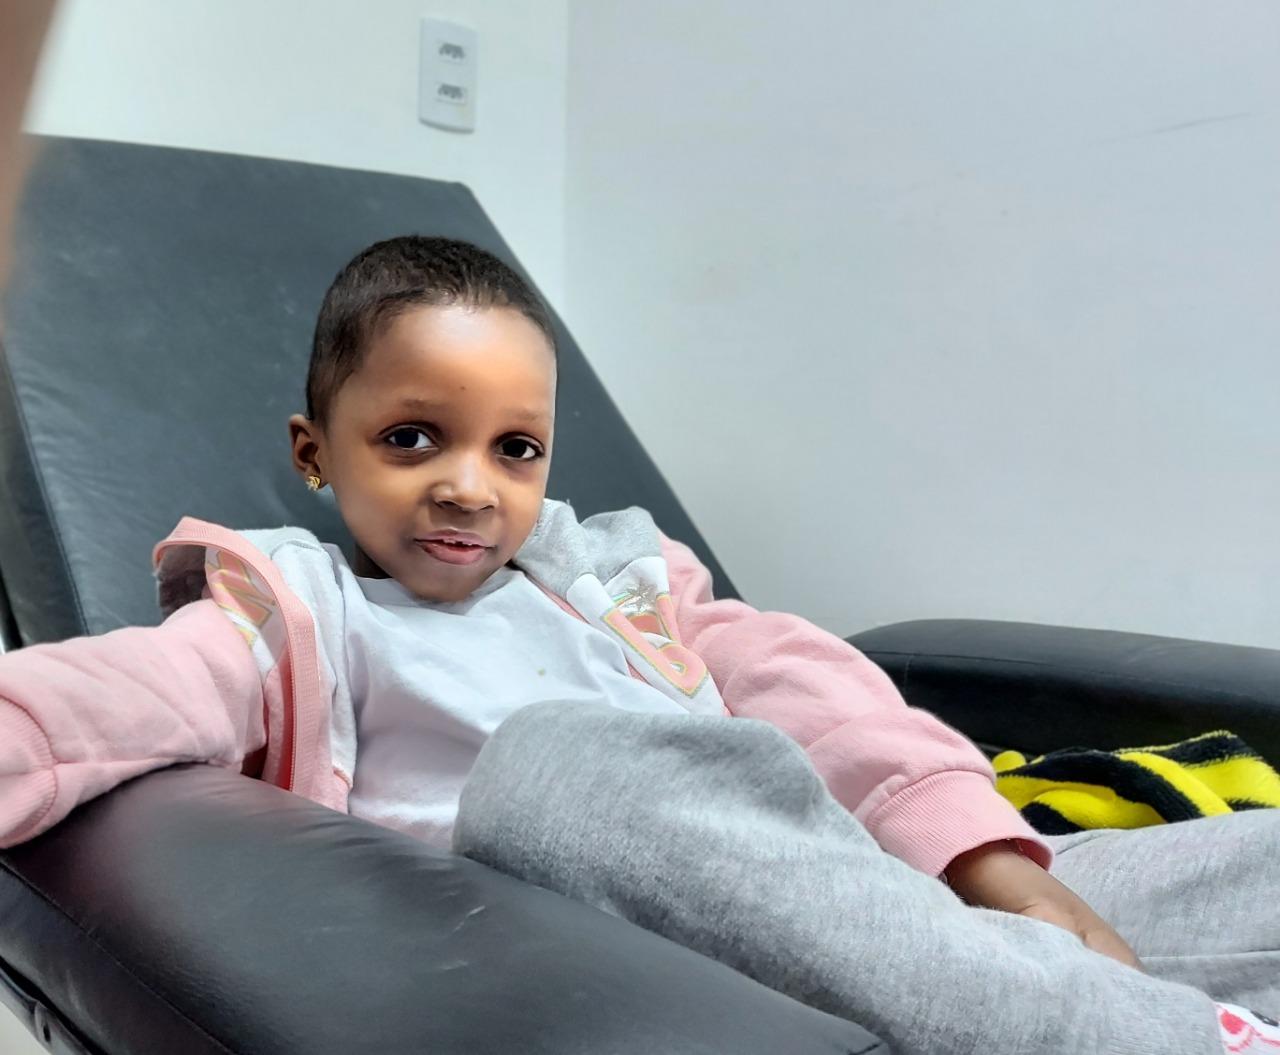 Martago-lana-campanha-para-manter-programa-de-transplantes